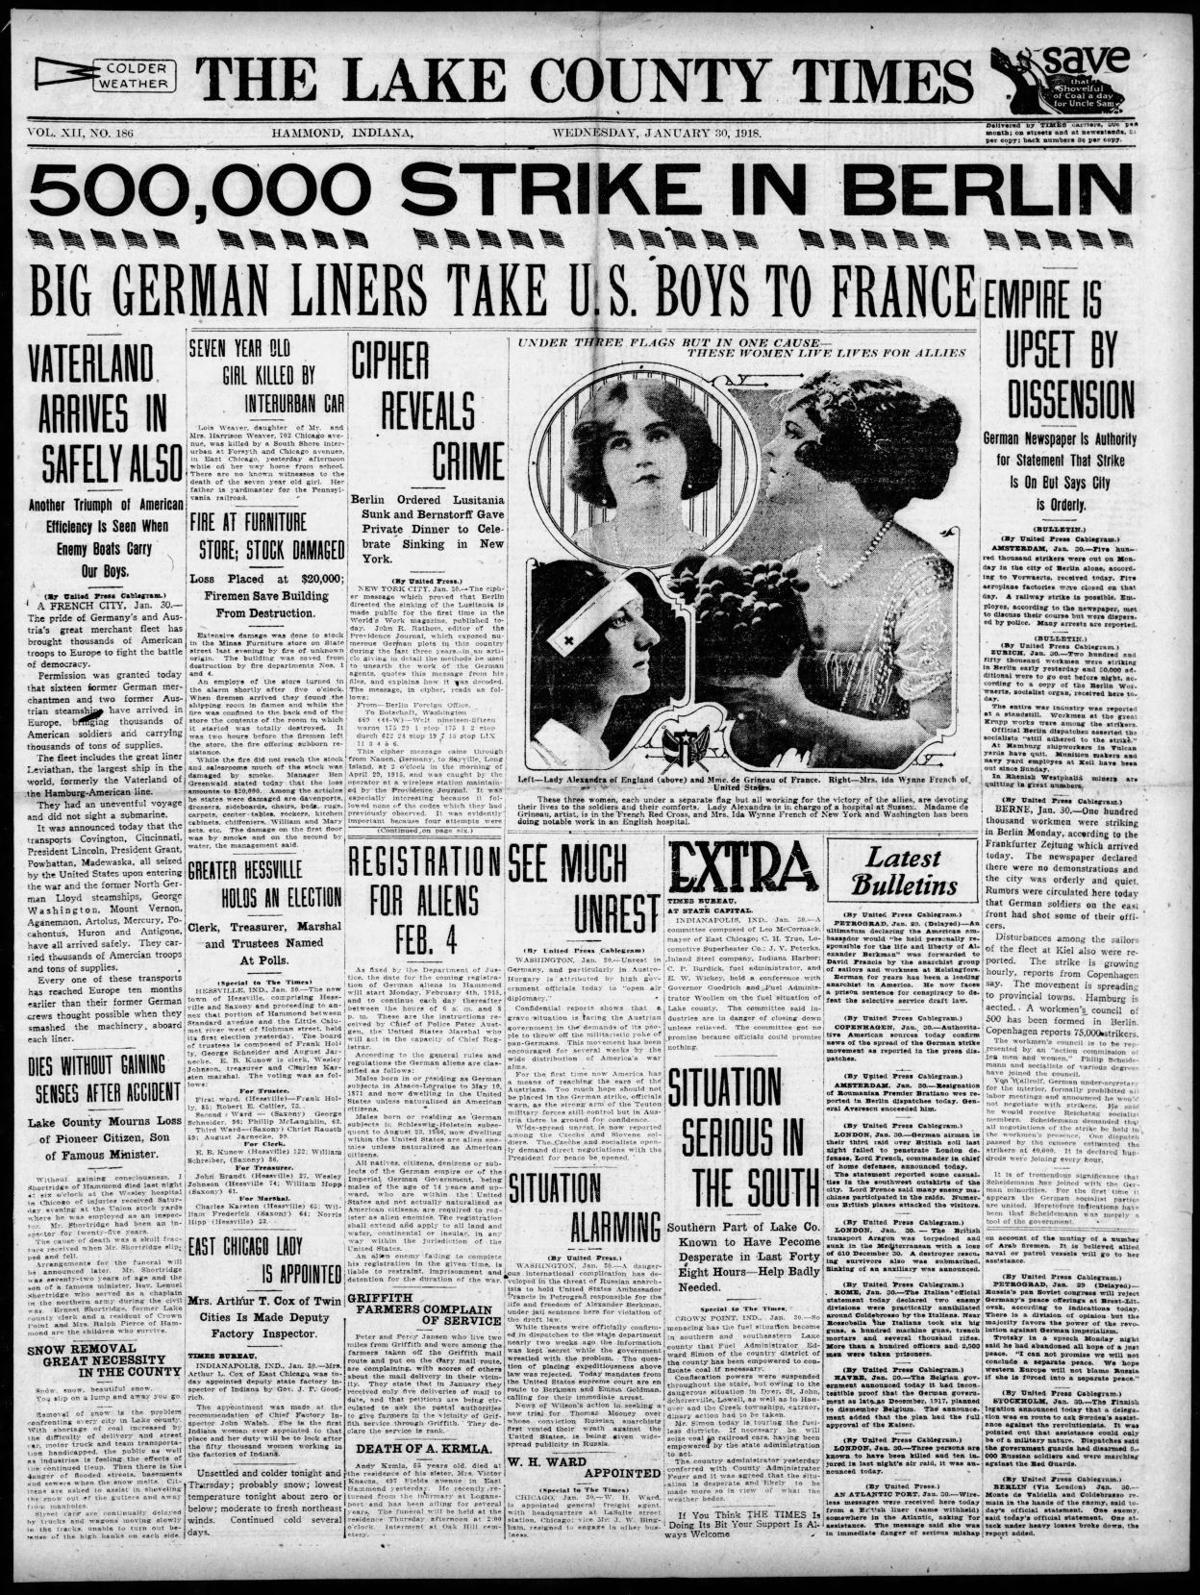 Jan. 30, 1918: Big German Liners Take U.S. Boys To France